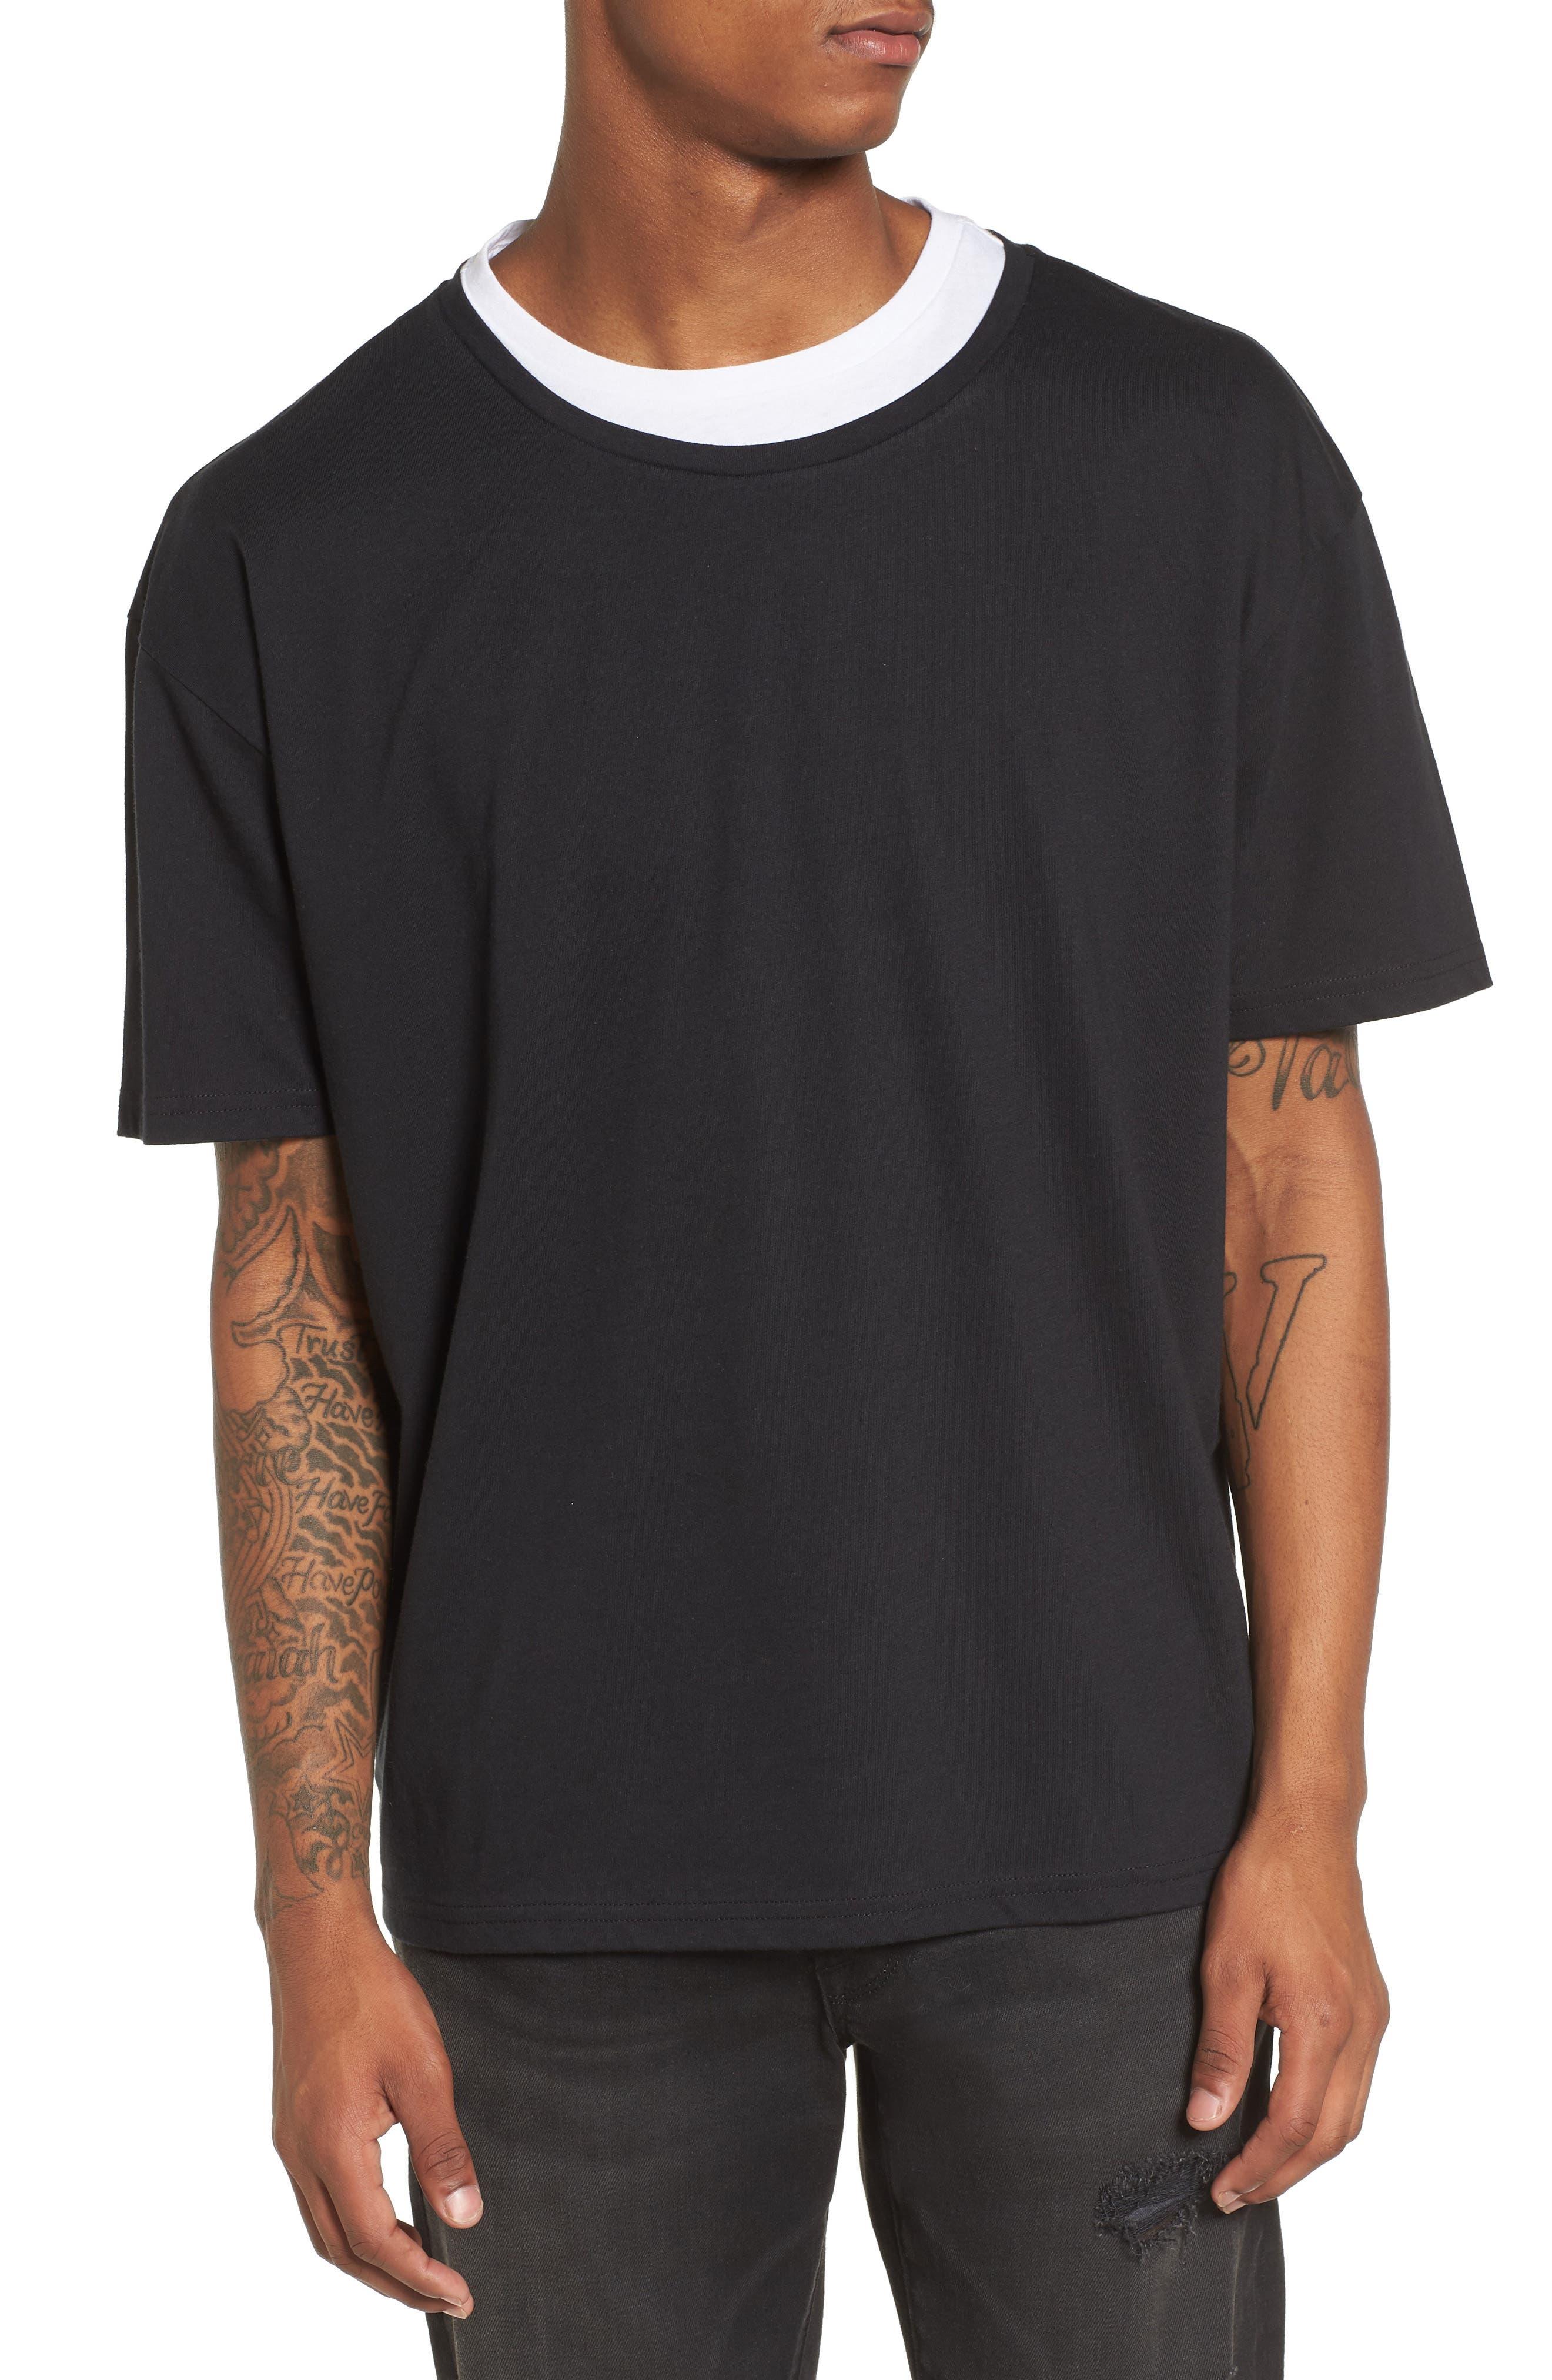 Double Layer T-Shirt,                             Main thumbnail 1, color,                             Black/ White